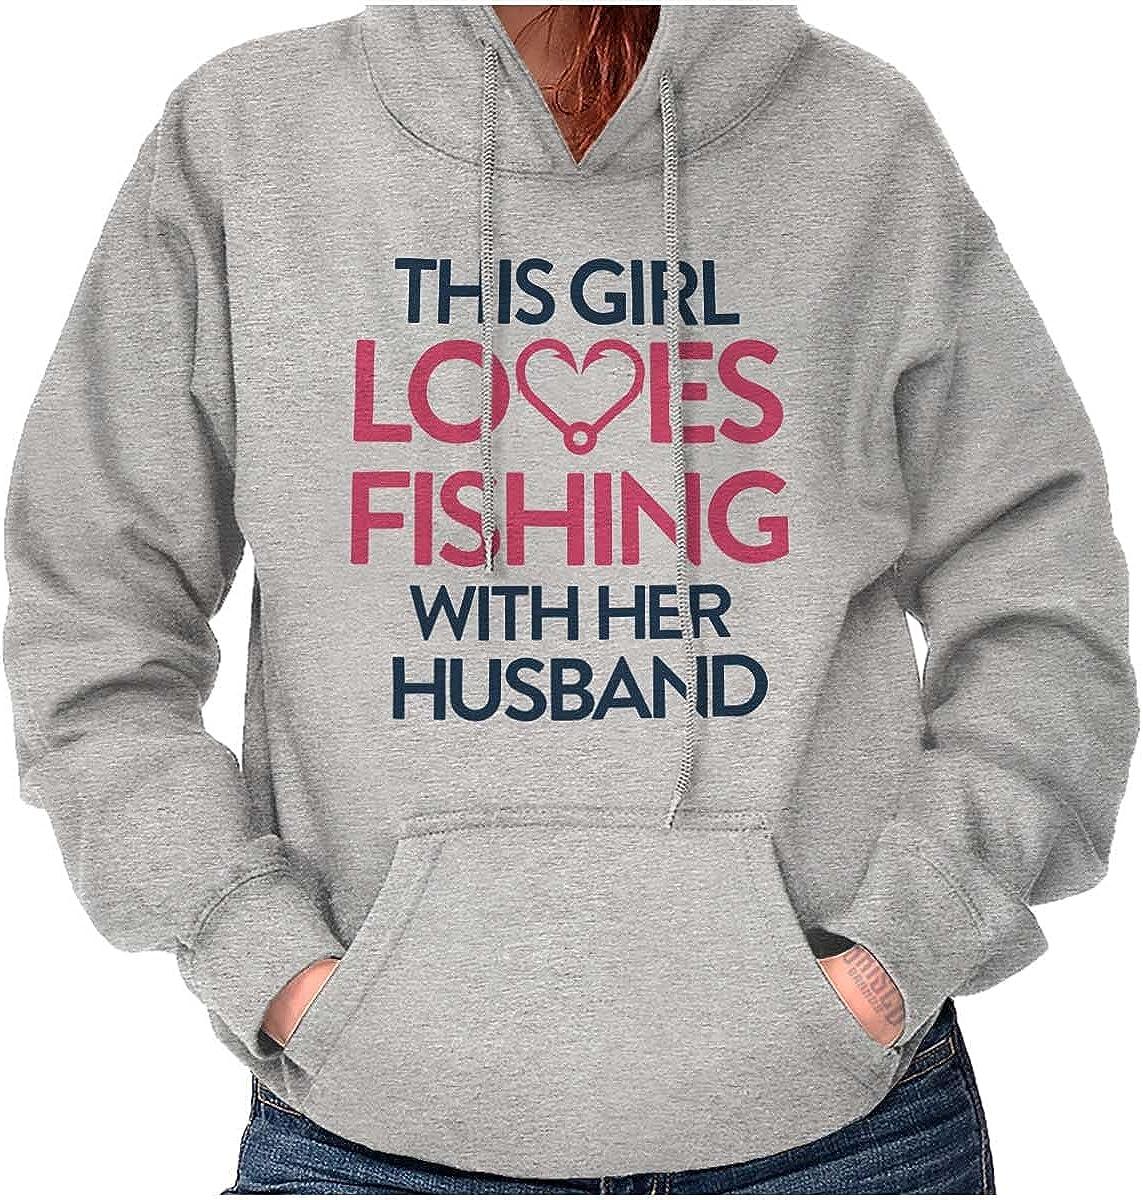 Wife Husband Loves Fishing Cute Girly Hoodie Sweatshirt Women